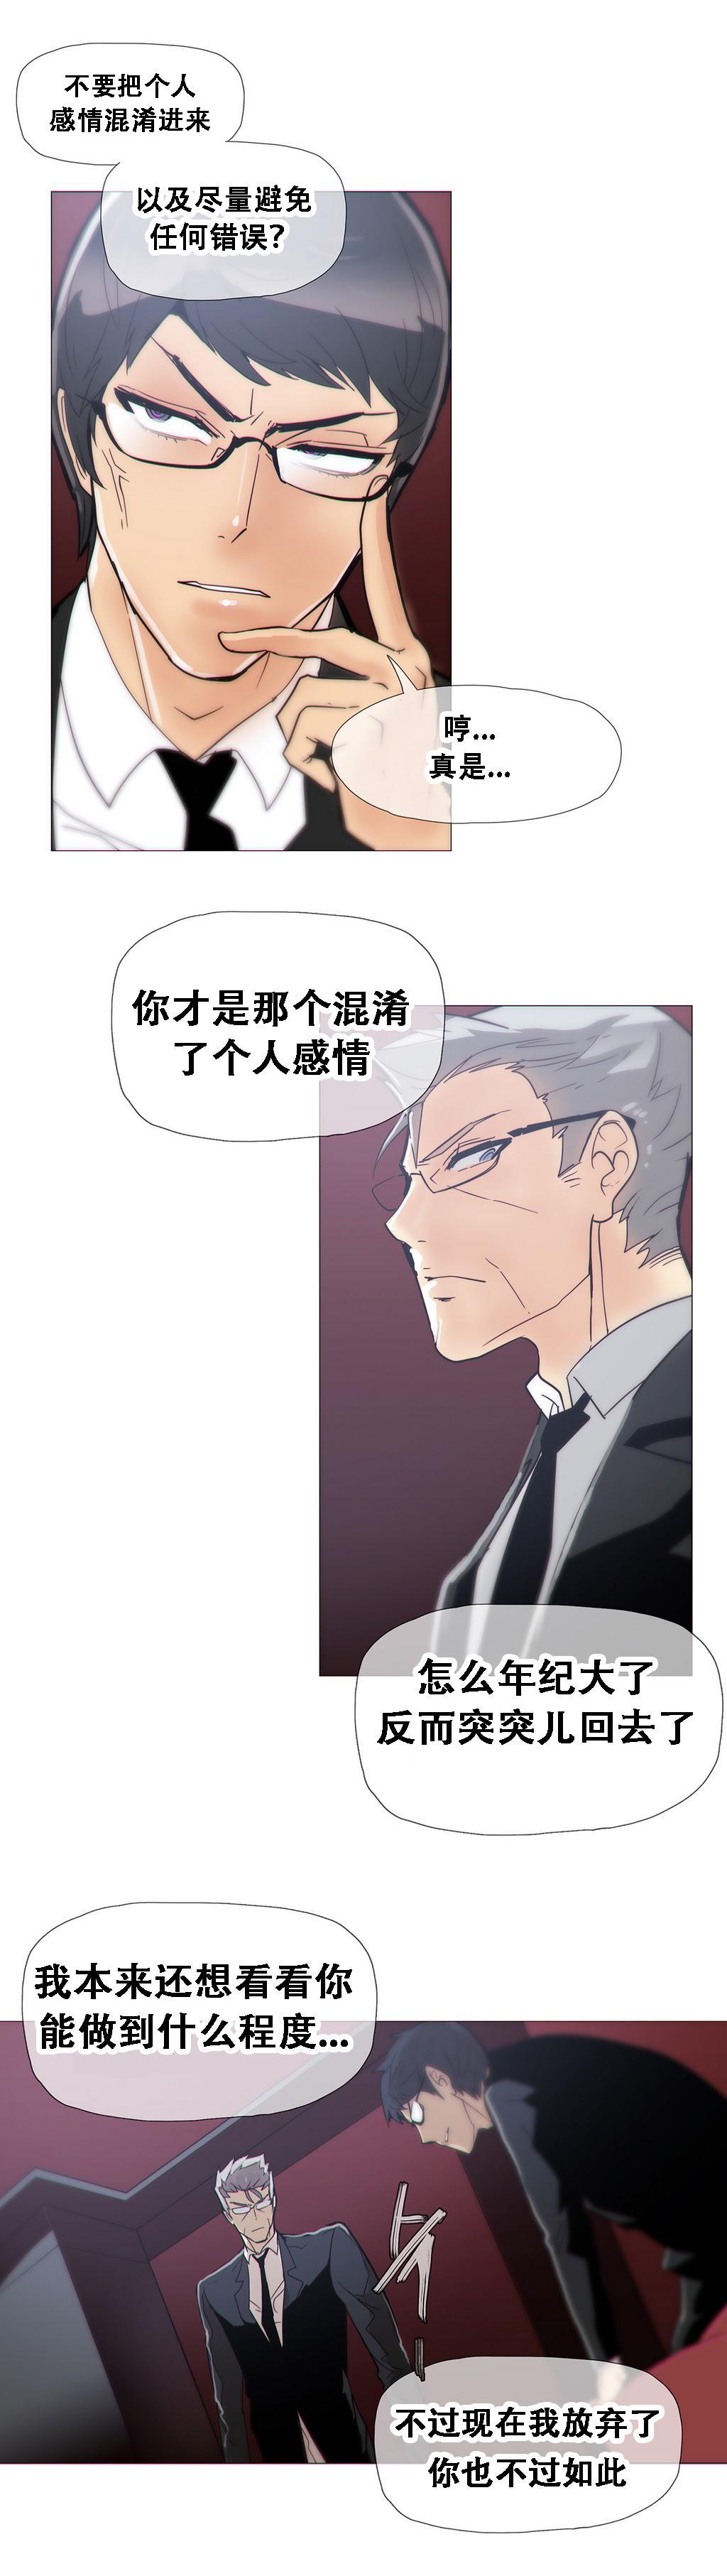 HouseHold Affairs 【卞赤鲤个人汉化】1~21话(持续更新中) 350